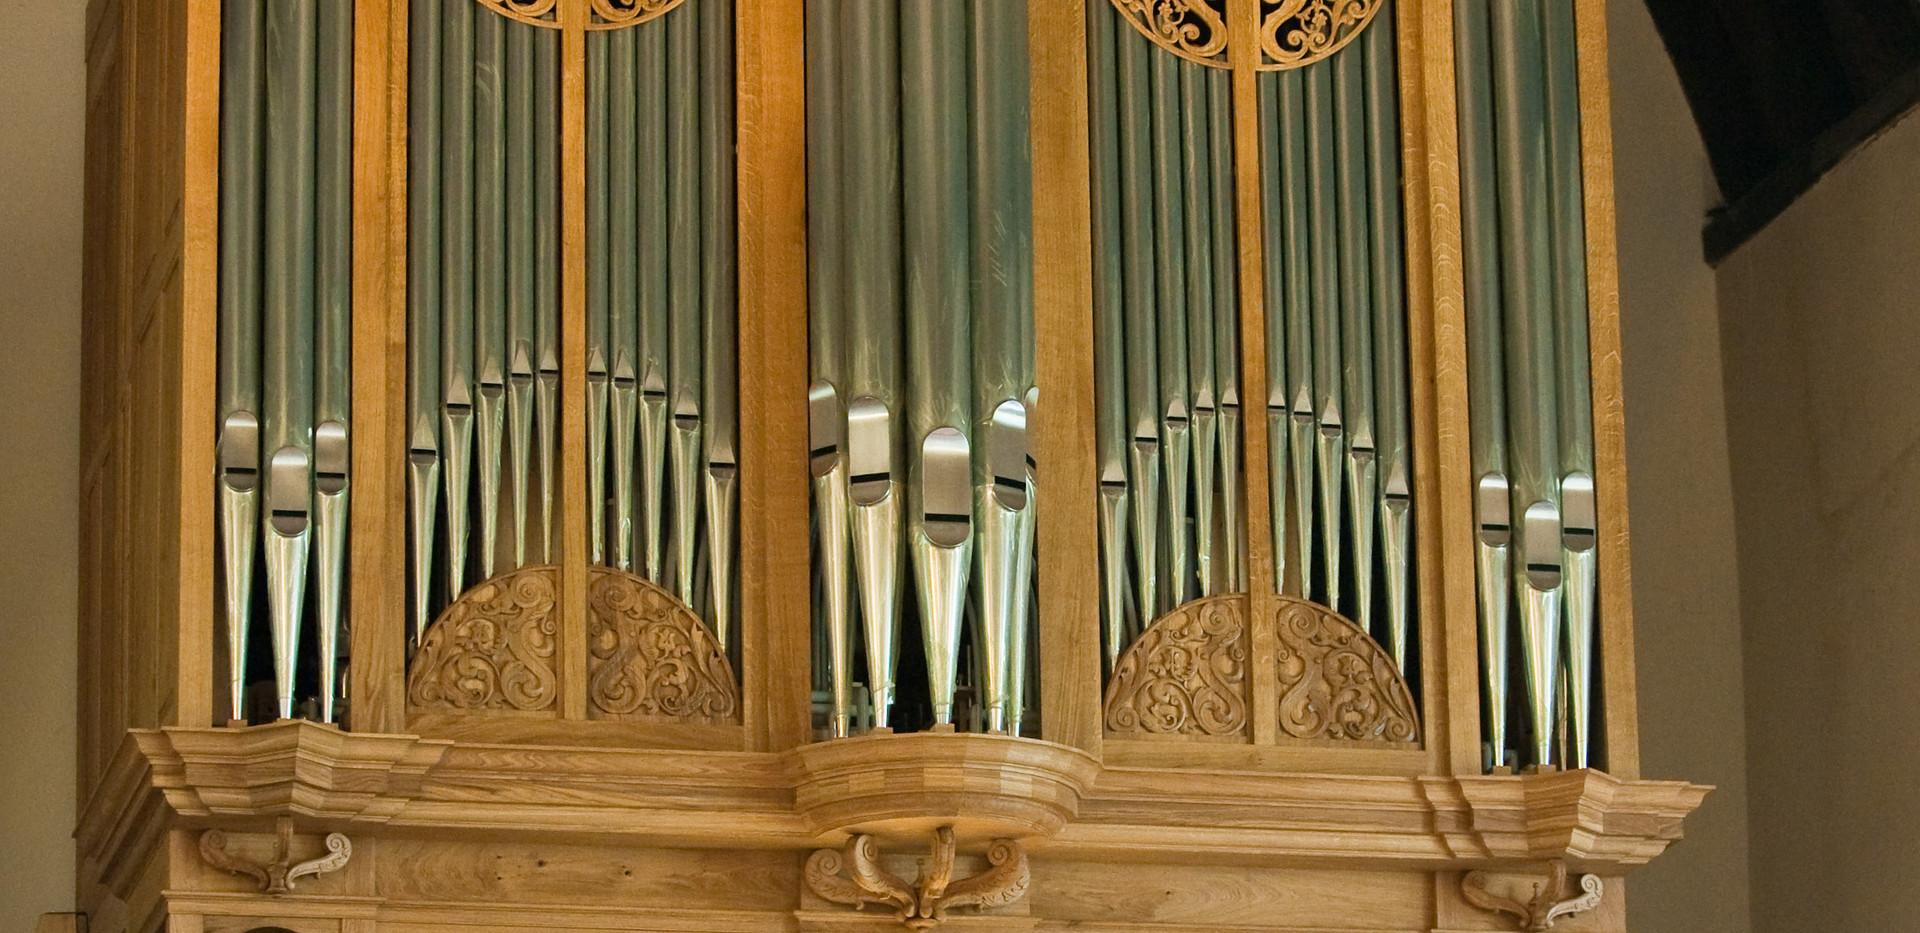 Odiham new organ low res-22.jpg